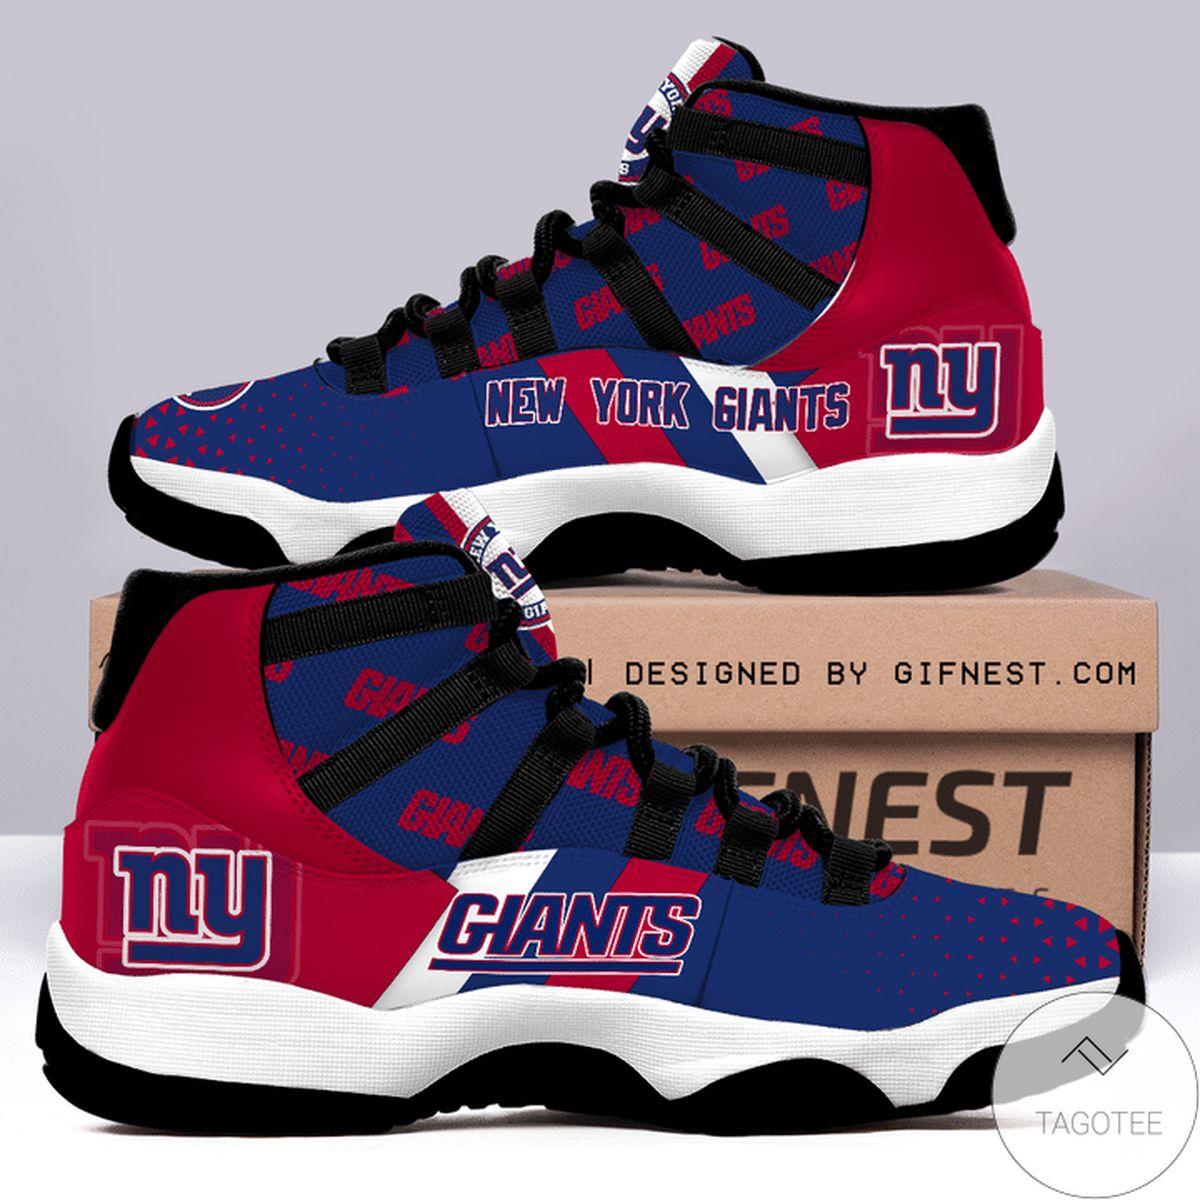 New York Giants Air Jordan 11 Shoes